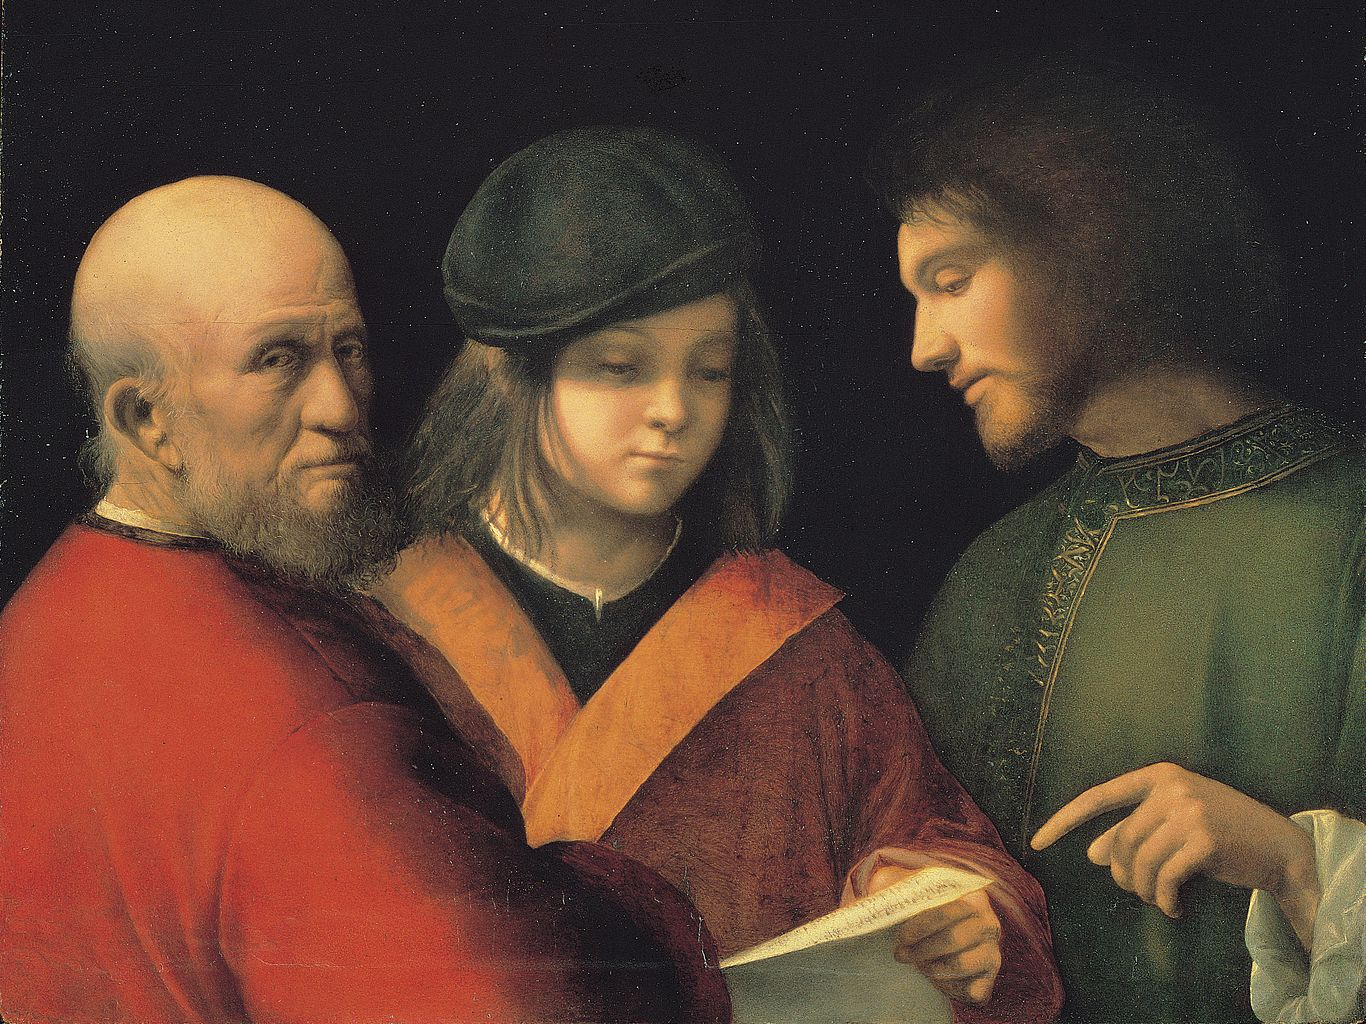 Джорджоне. Три возраста человека. 1510